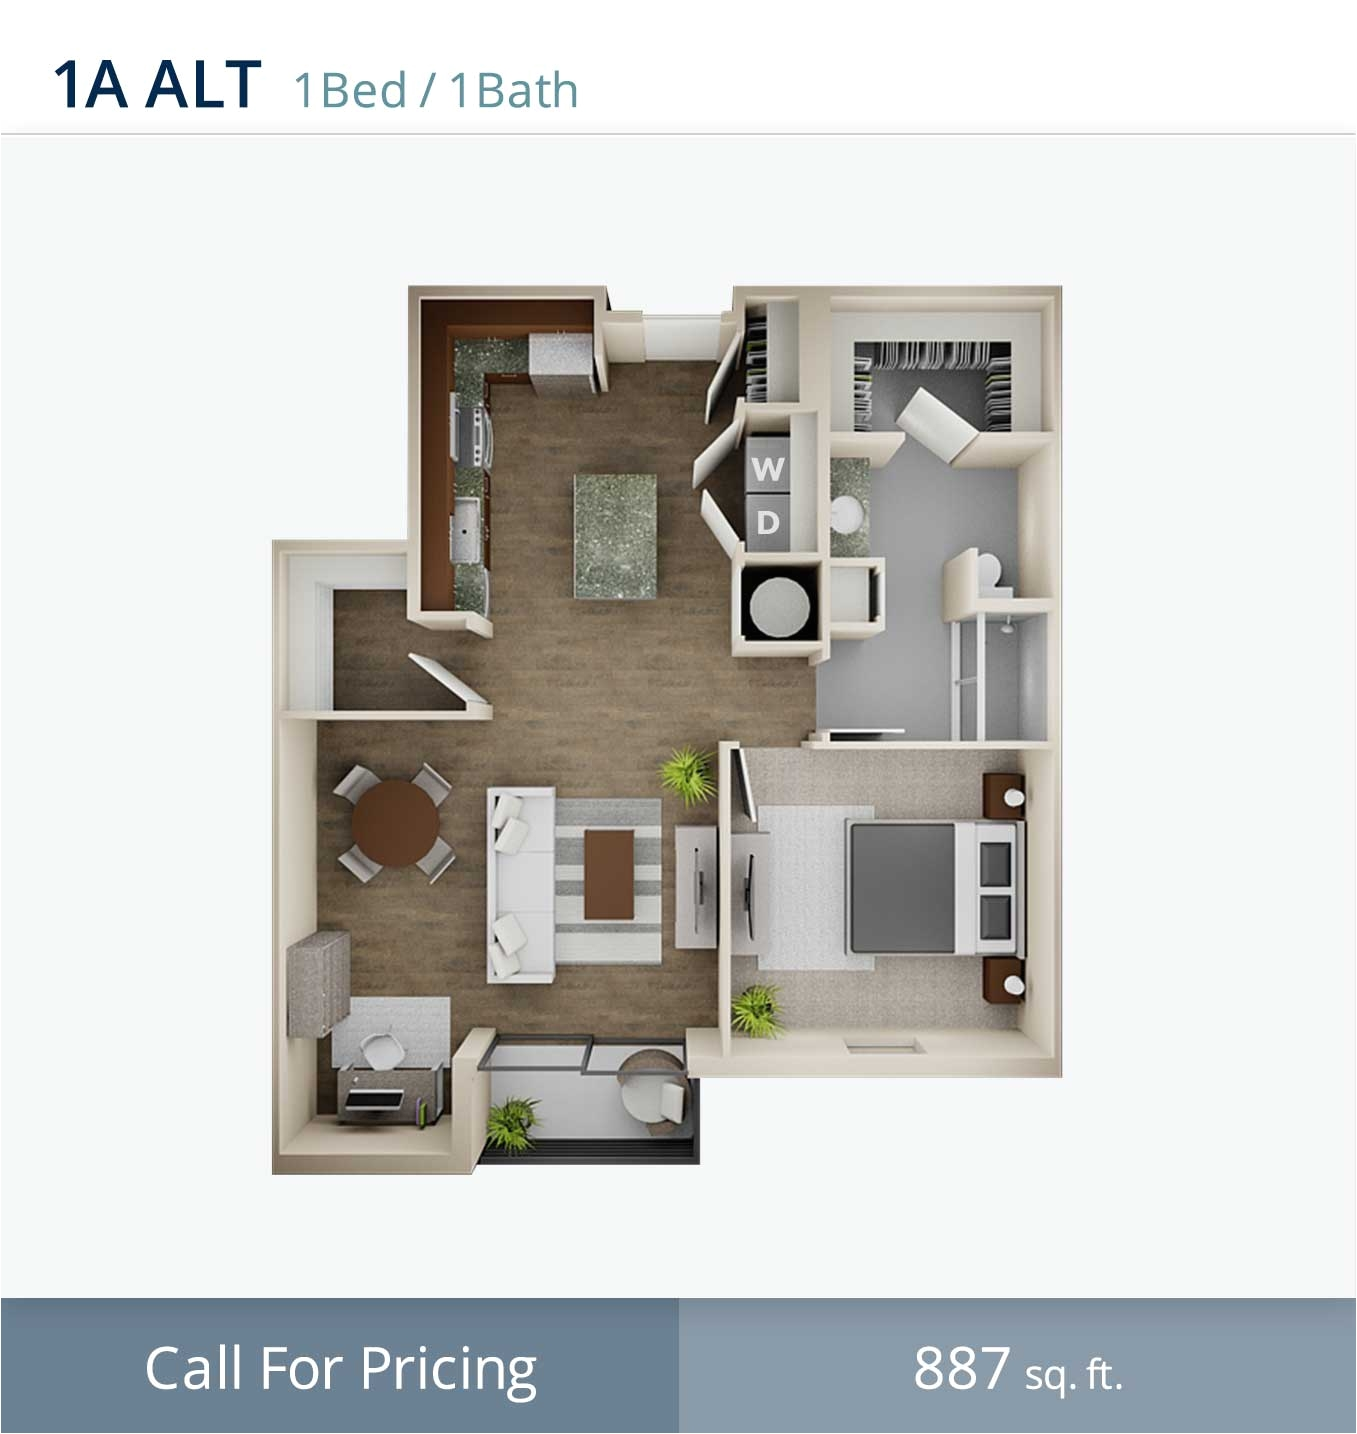 1 Bedroom Apartments In Baton Rouge Cheap Apartments Rent Floor